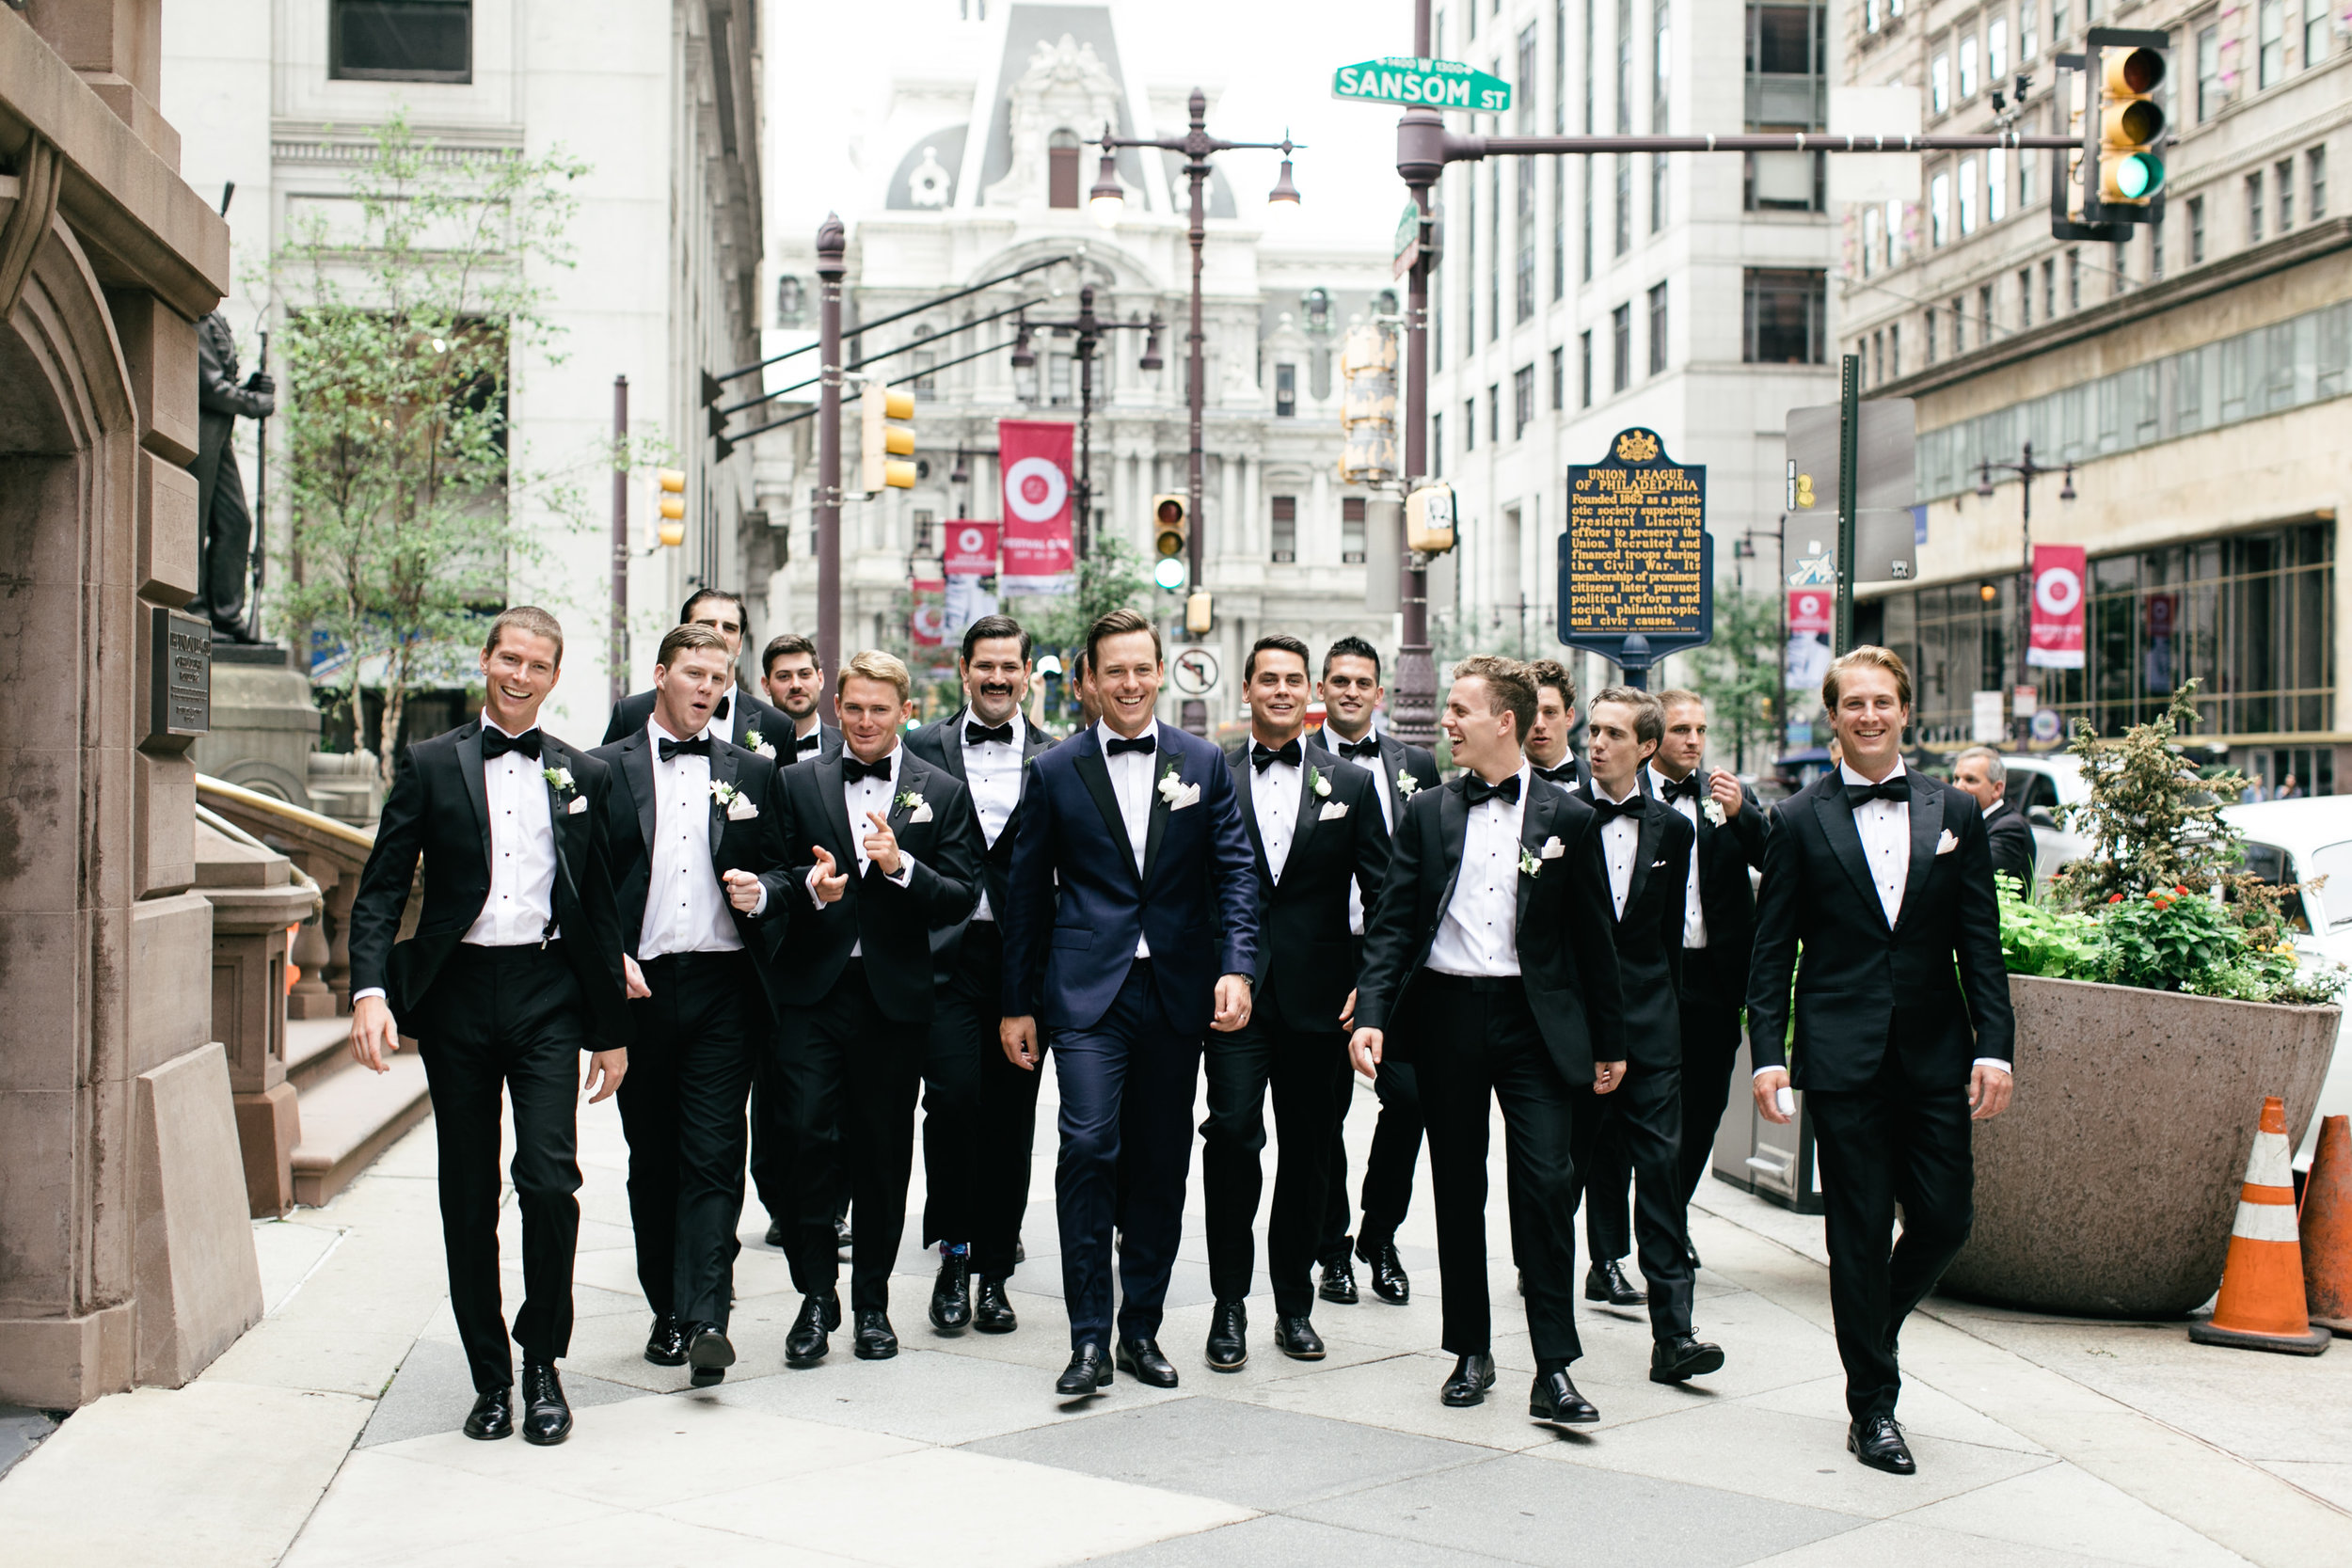 photography-wedding-weddings-natural-candid-union league-philadelphia-black tie-city hall-broad street-editorial-modern-fine-art-14.JPG